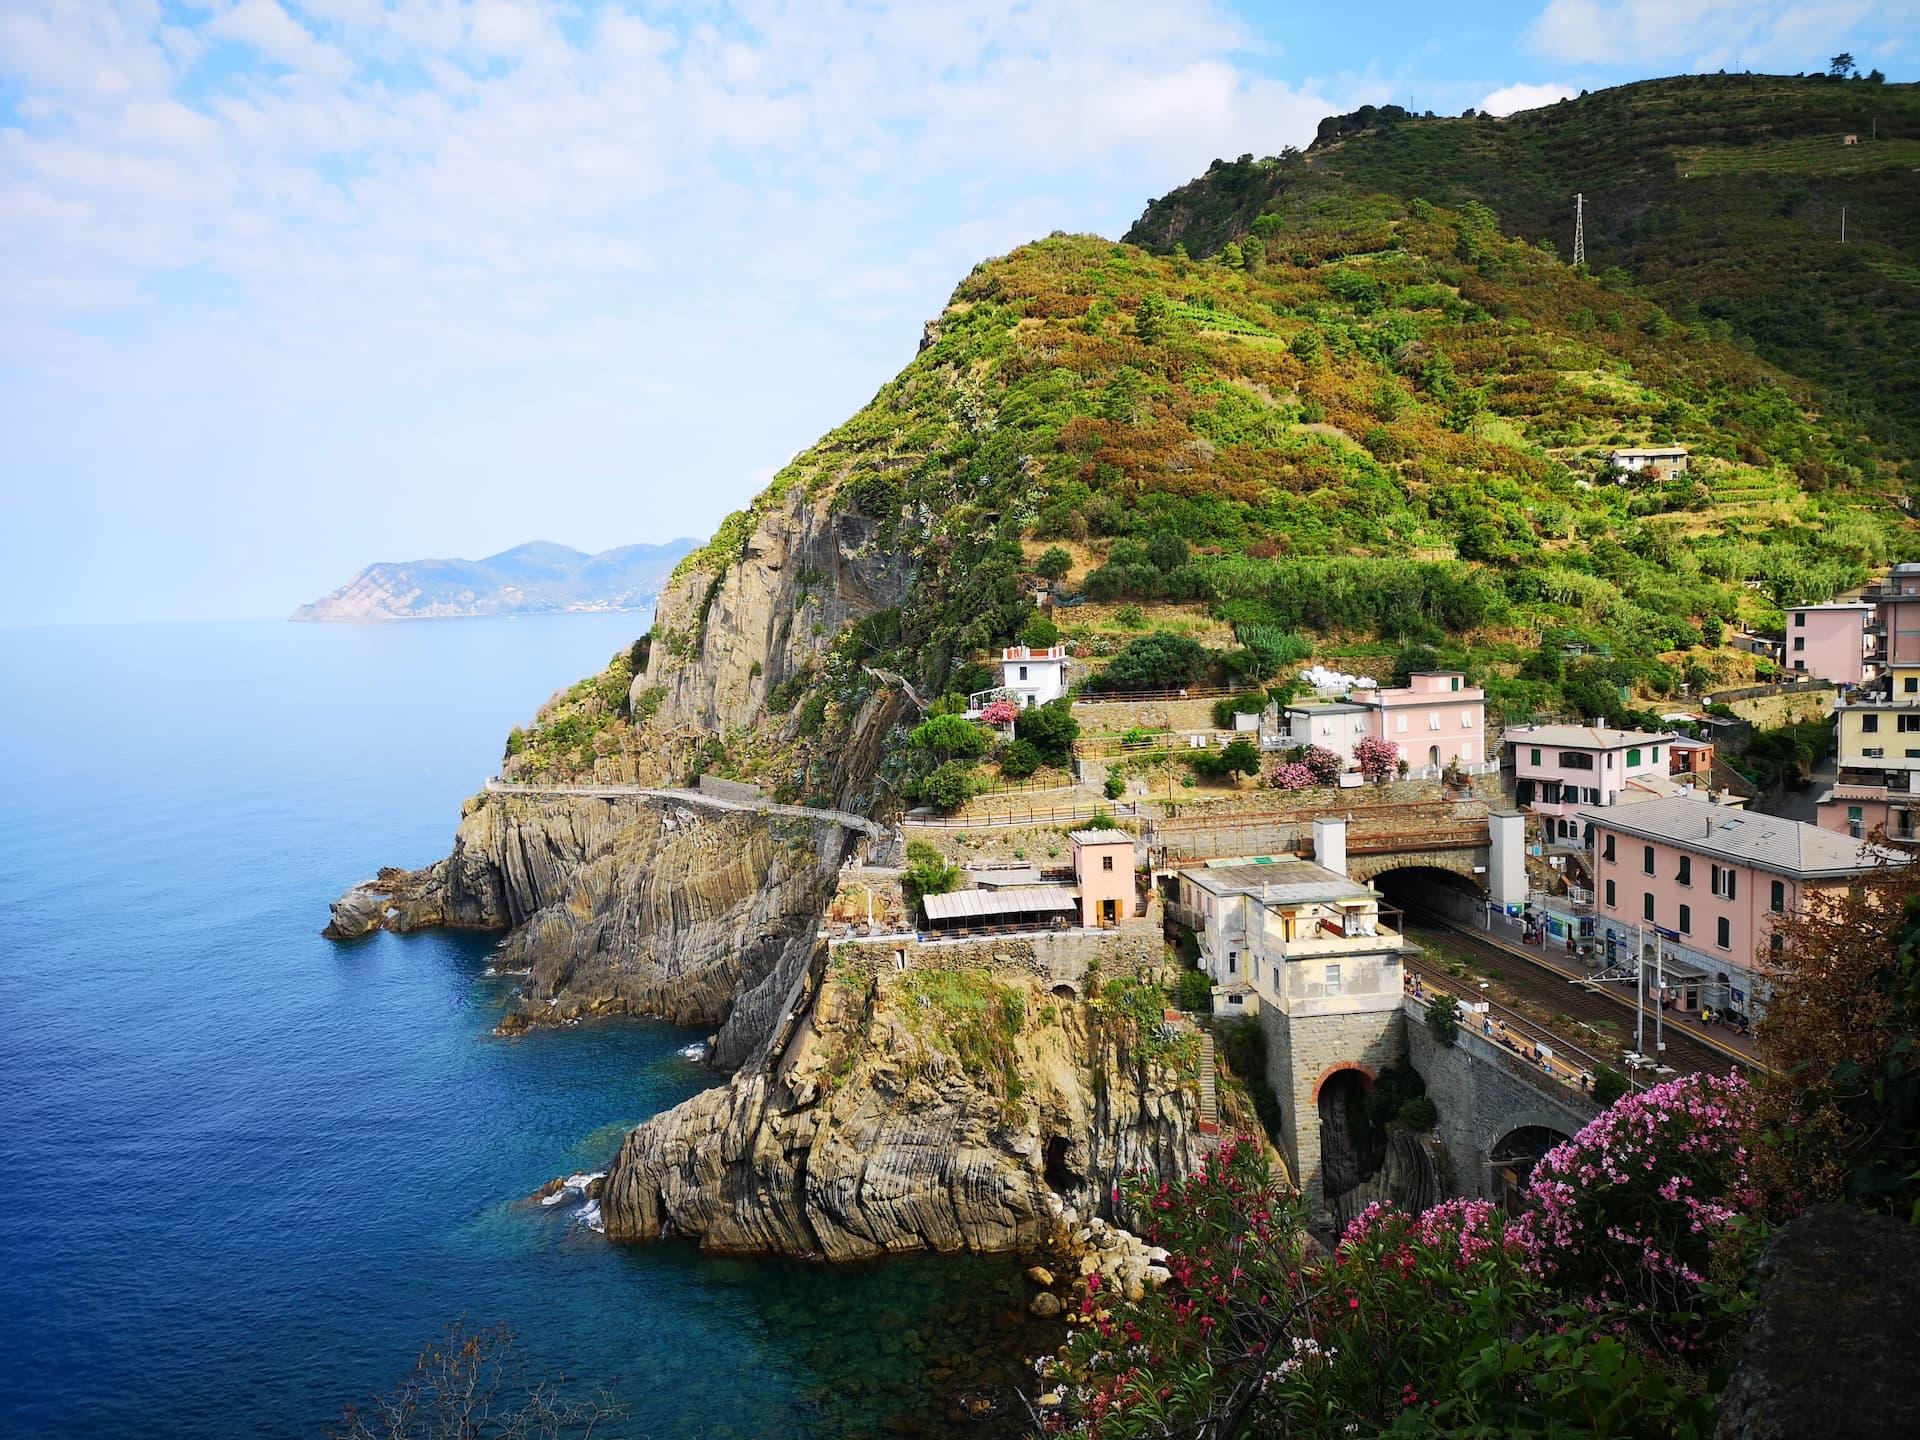 Decorul natural în Cinque Terre